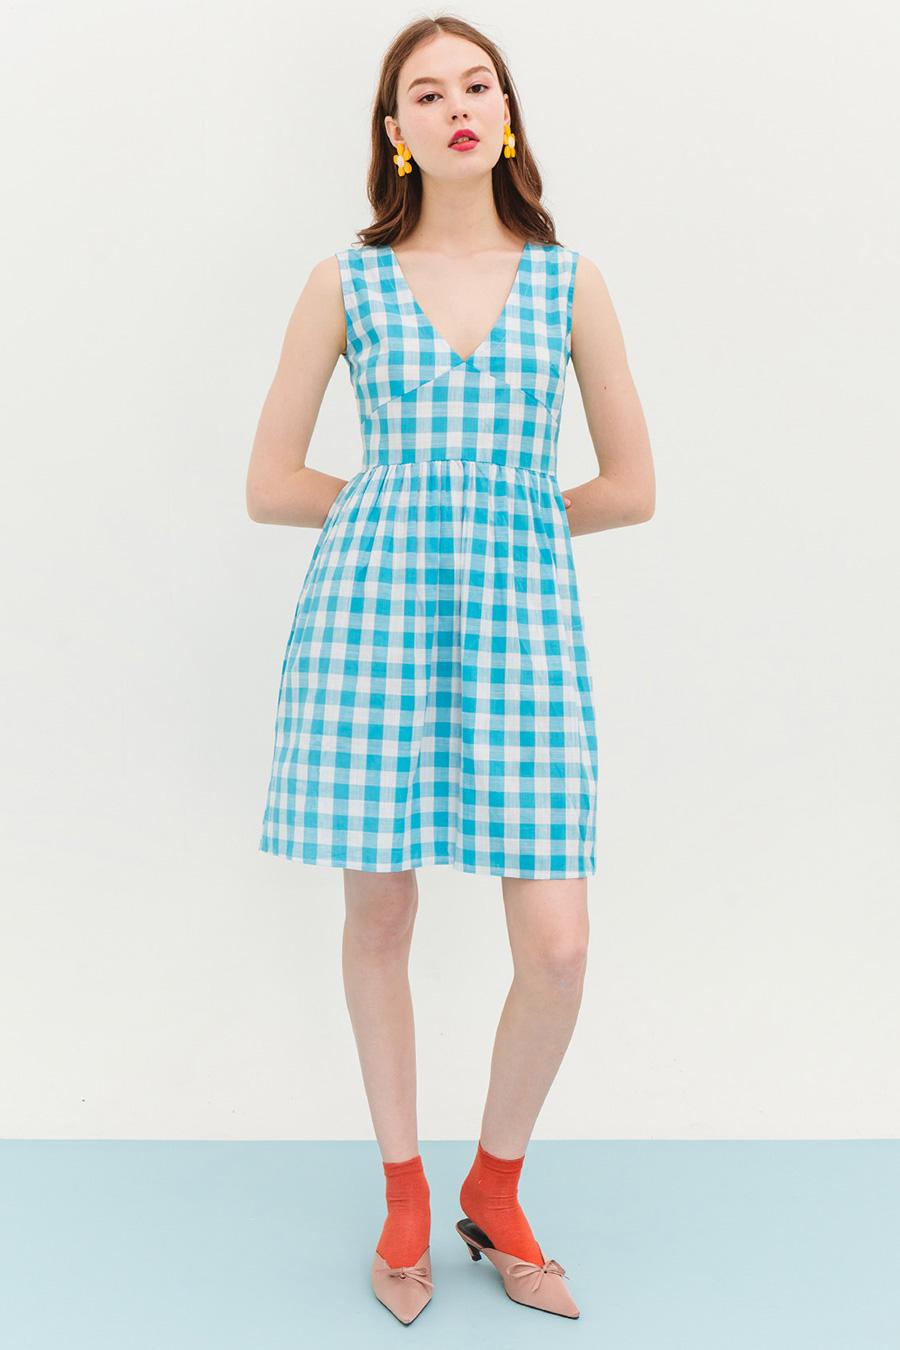 BUXTON DRESS - BLUEBERRY